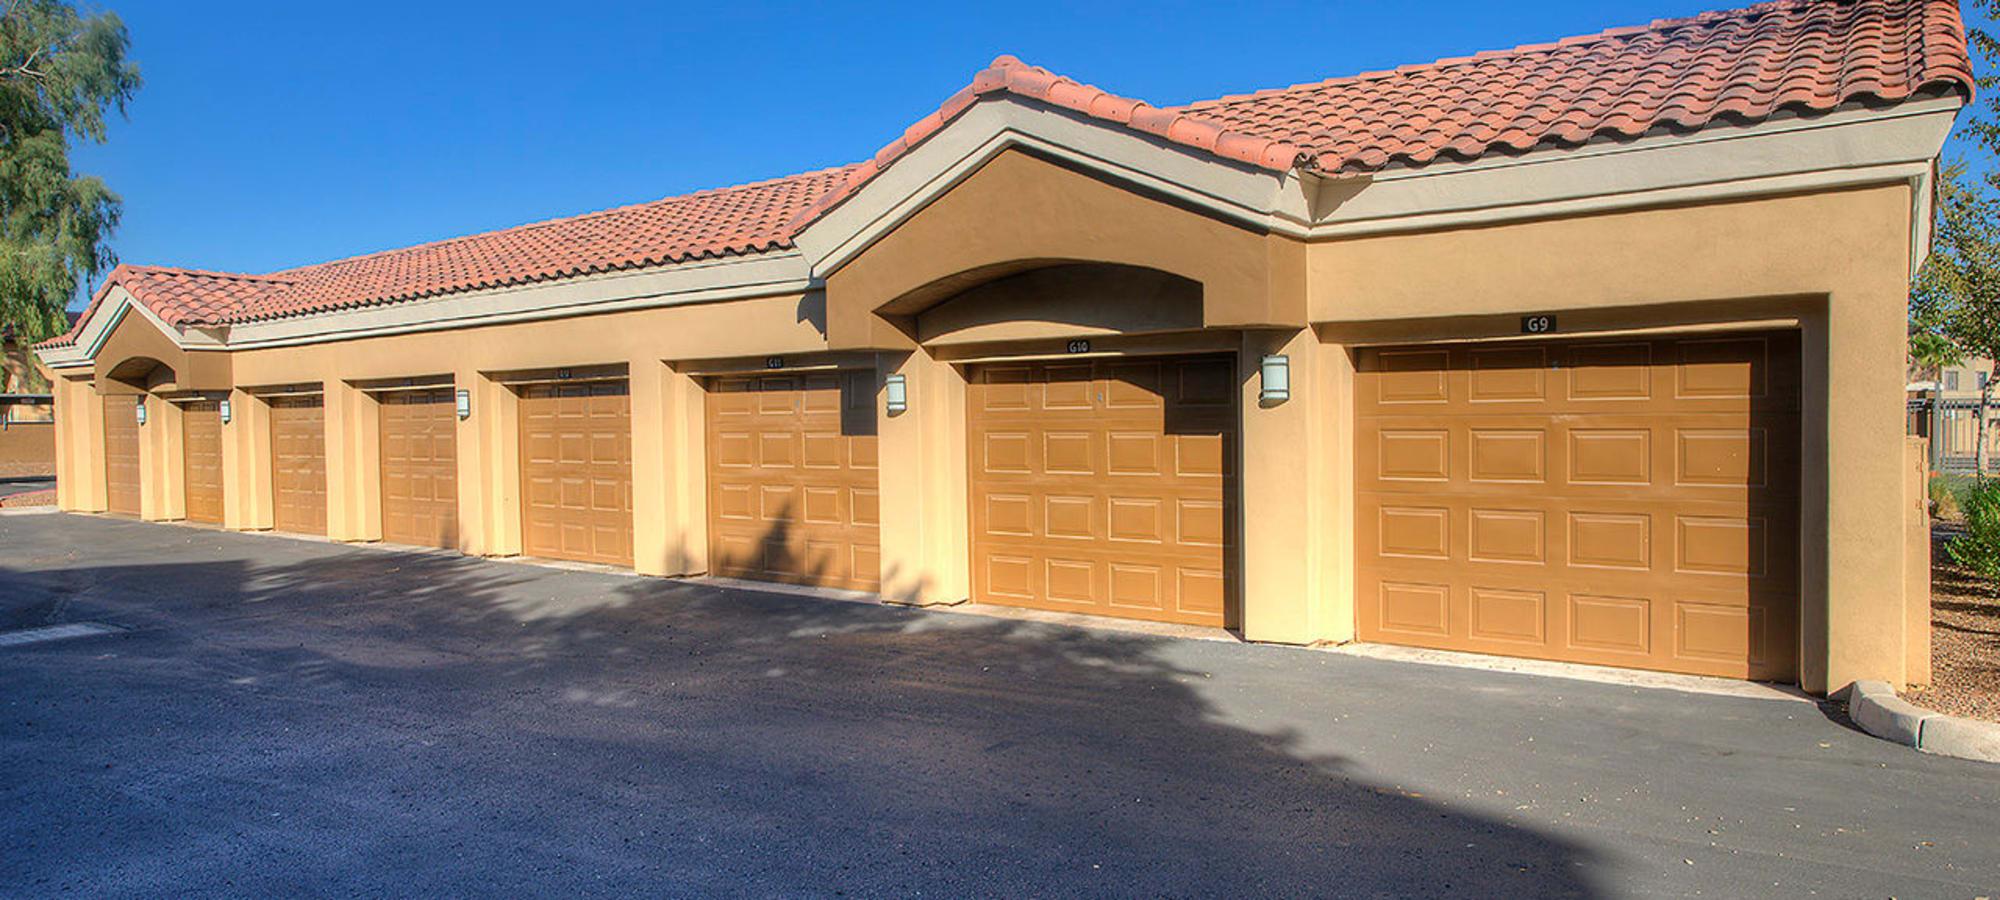 Garage parking upgrade at Park on Bell in Phoenix, Arizona